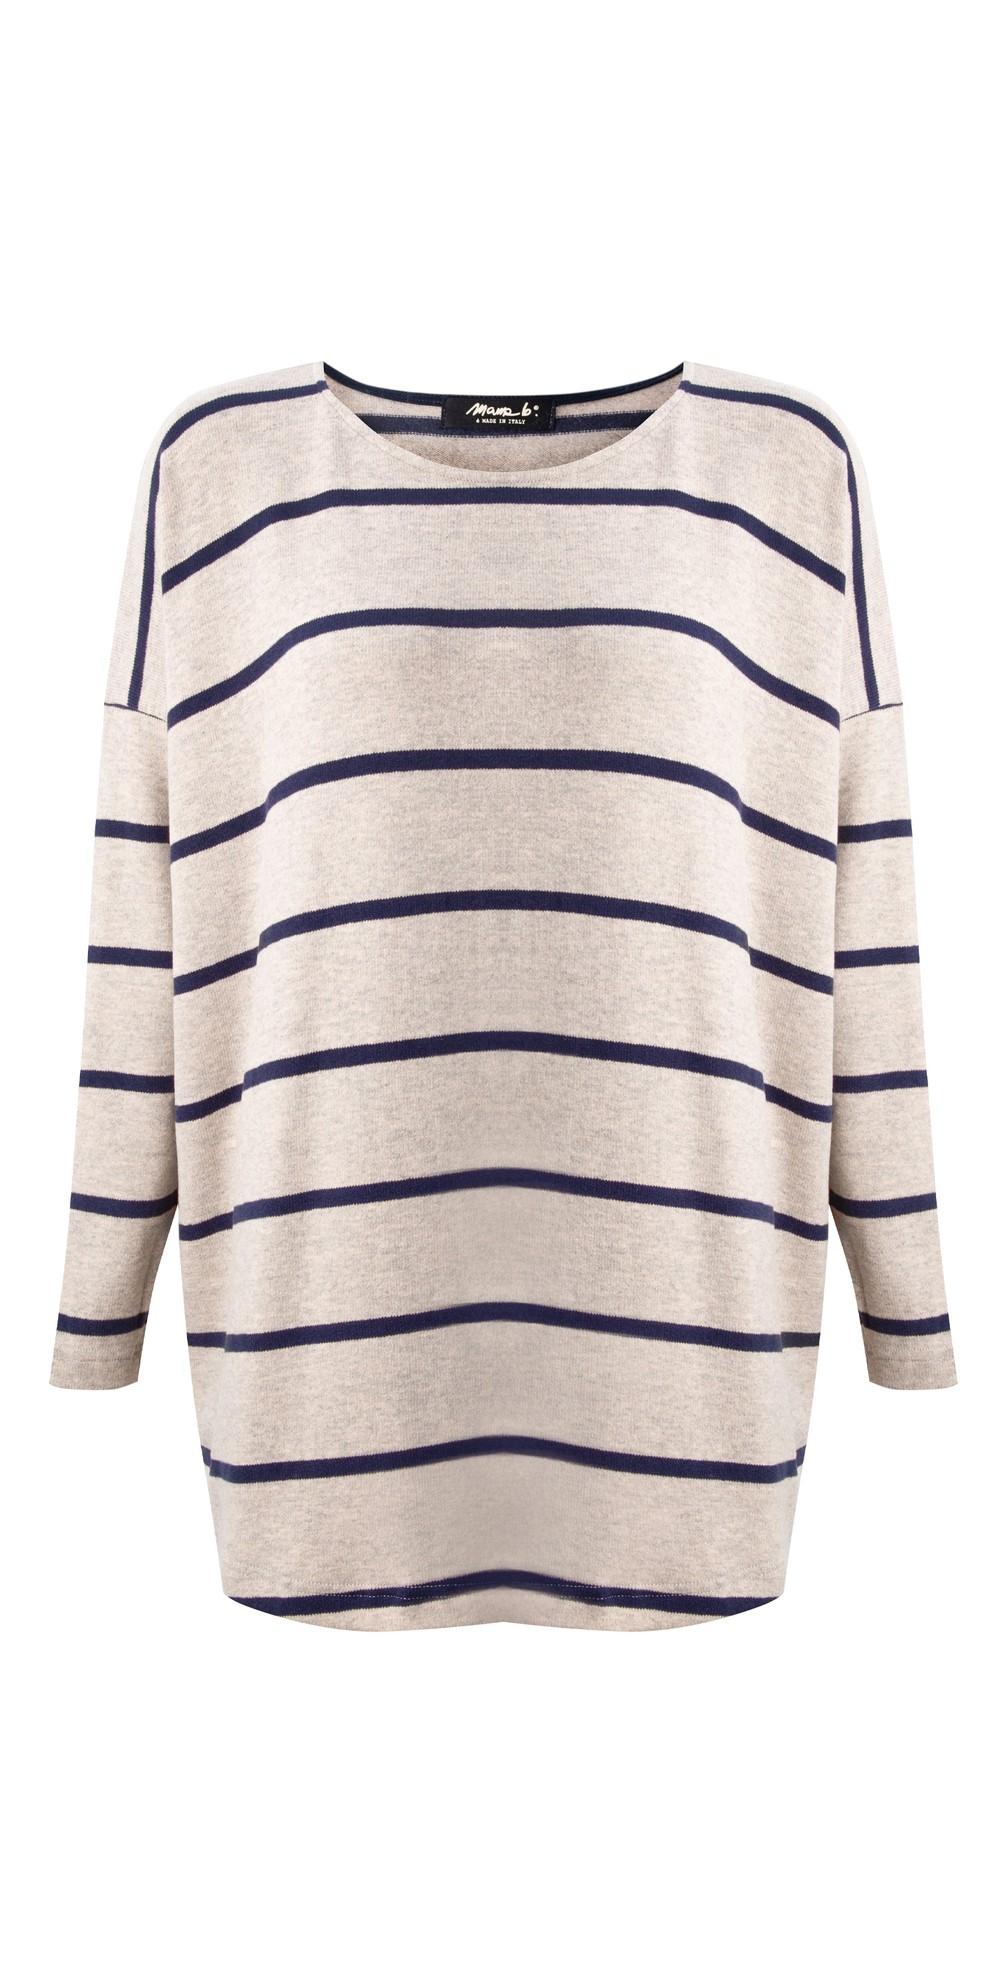 Sunny RG Wide Stripe Fleece Jumper main image